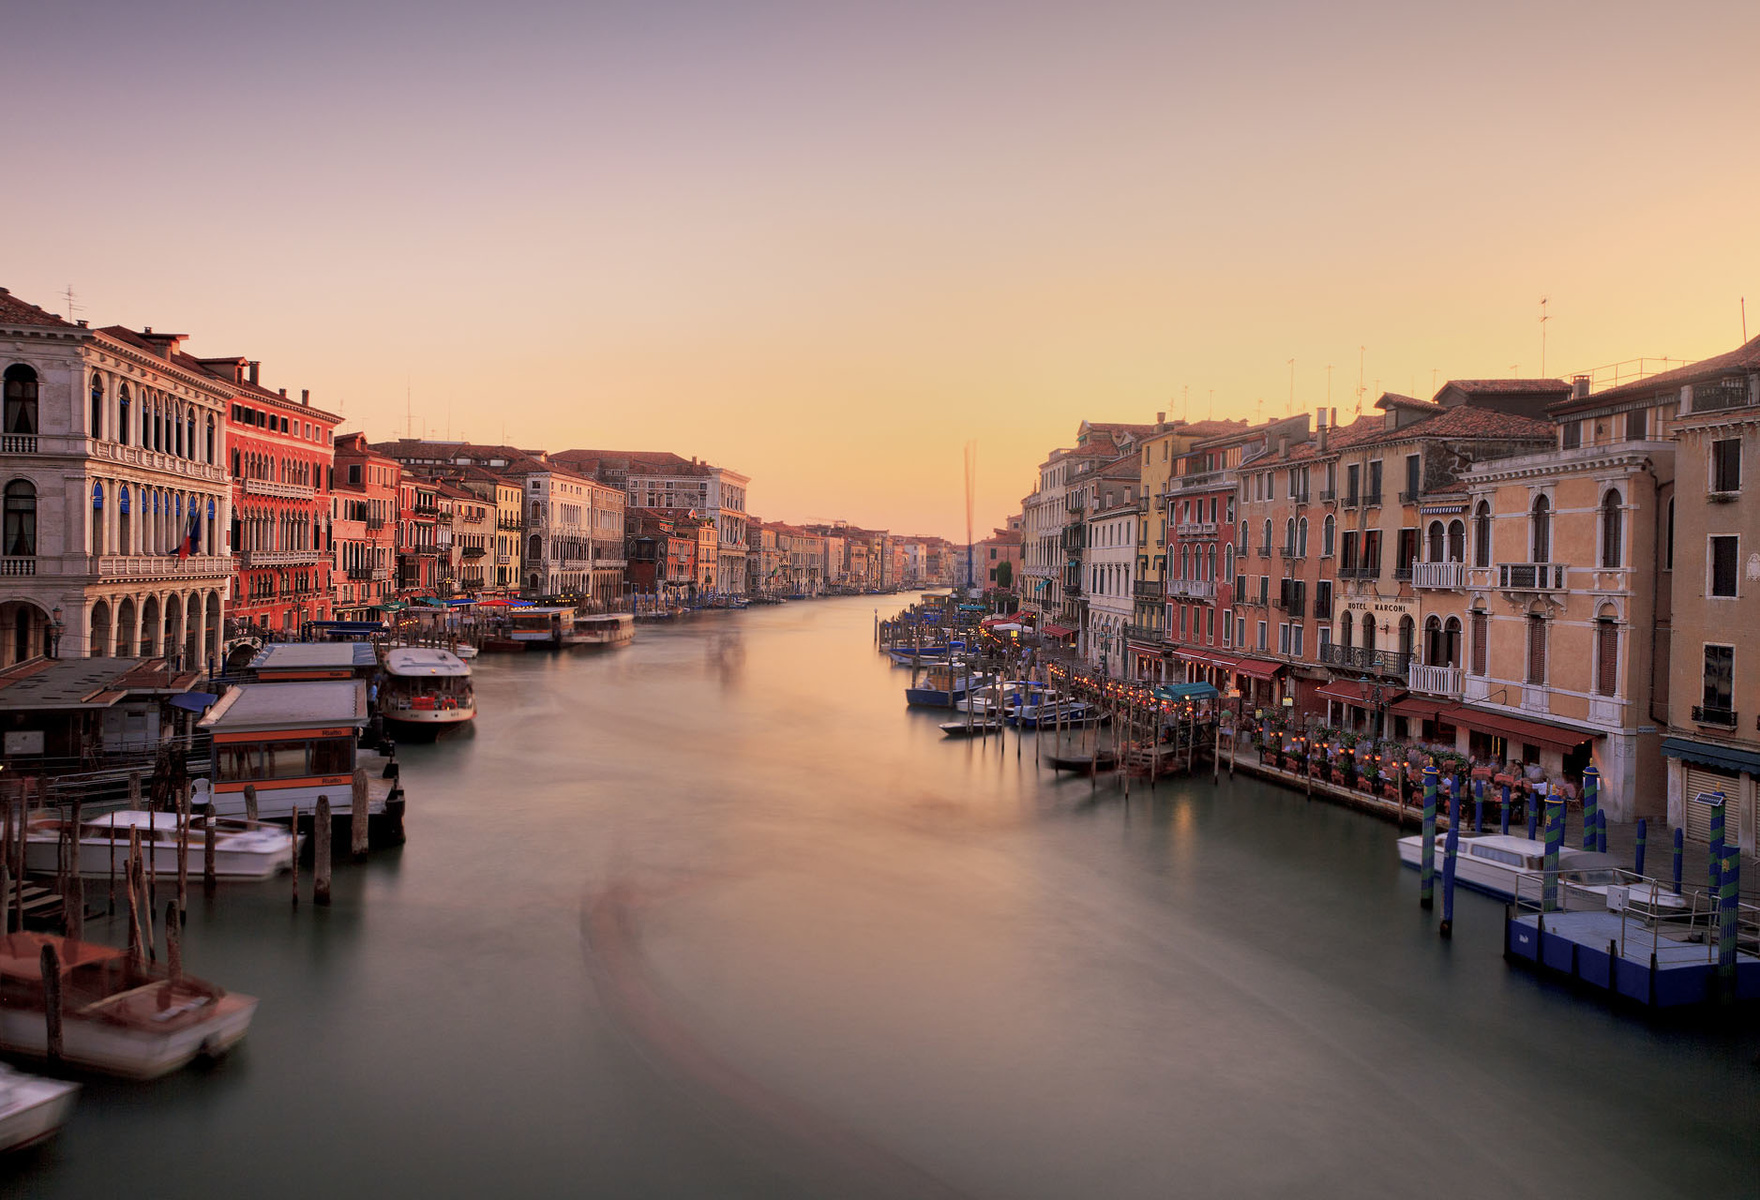 32358-1639372-2011_08_23_Venice_005.jpg